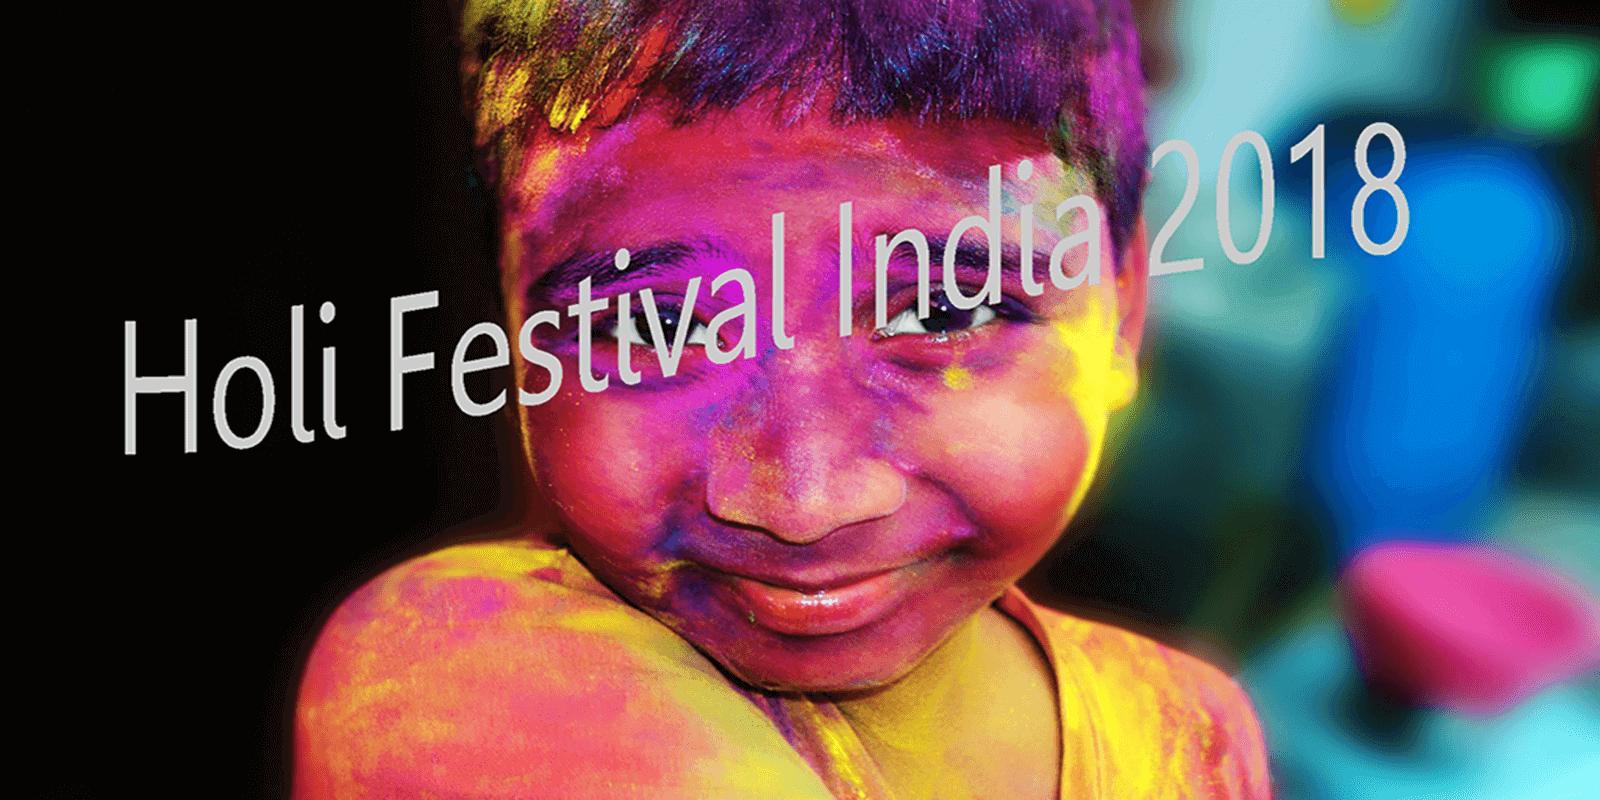 Holi festival India 2019 Holi festival, Holi festival